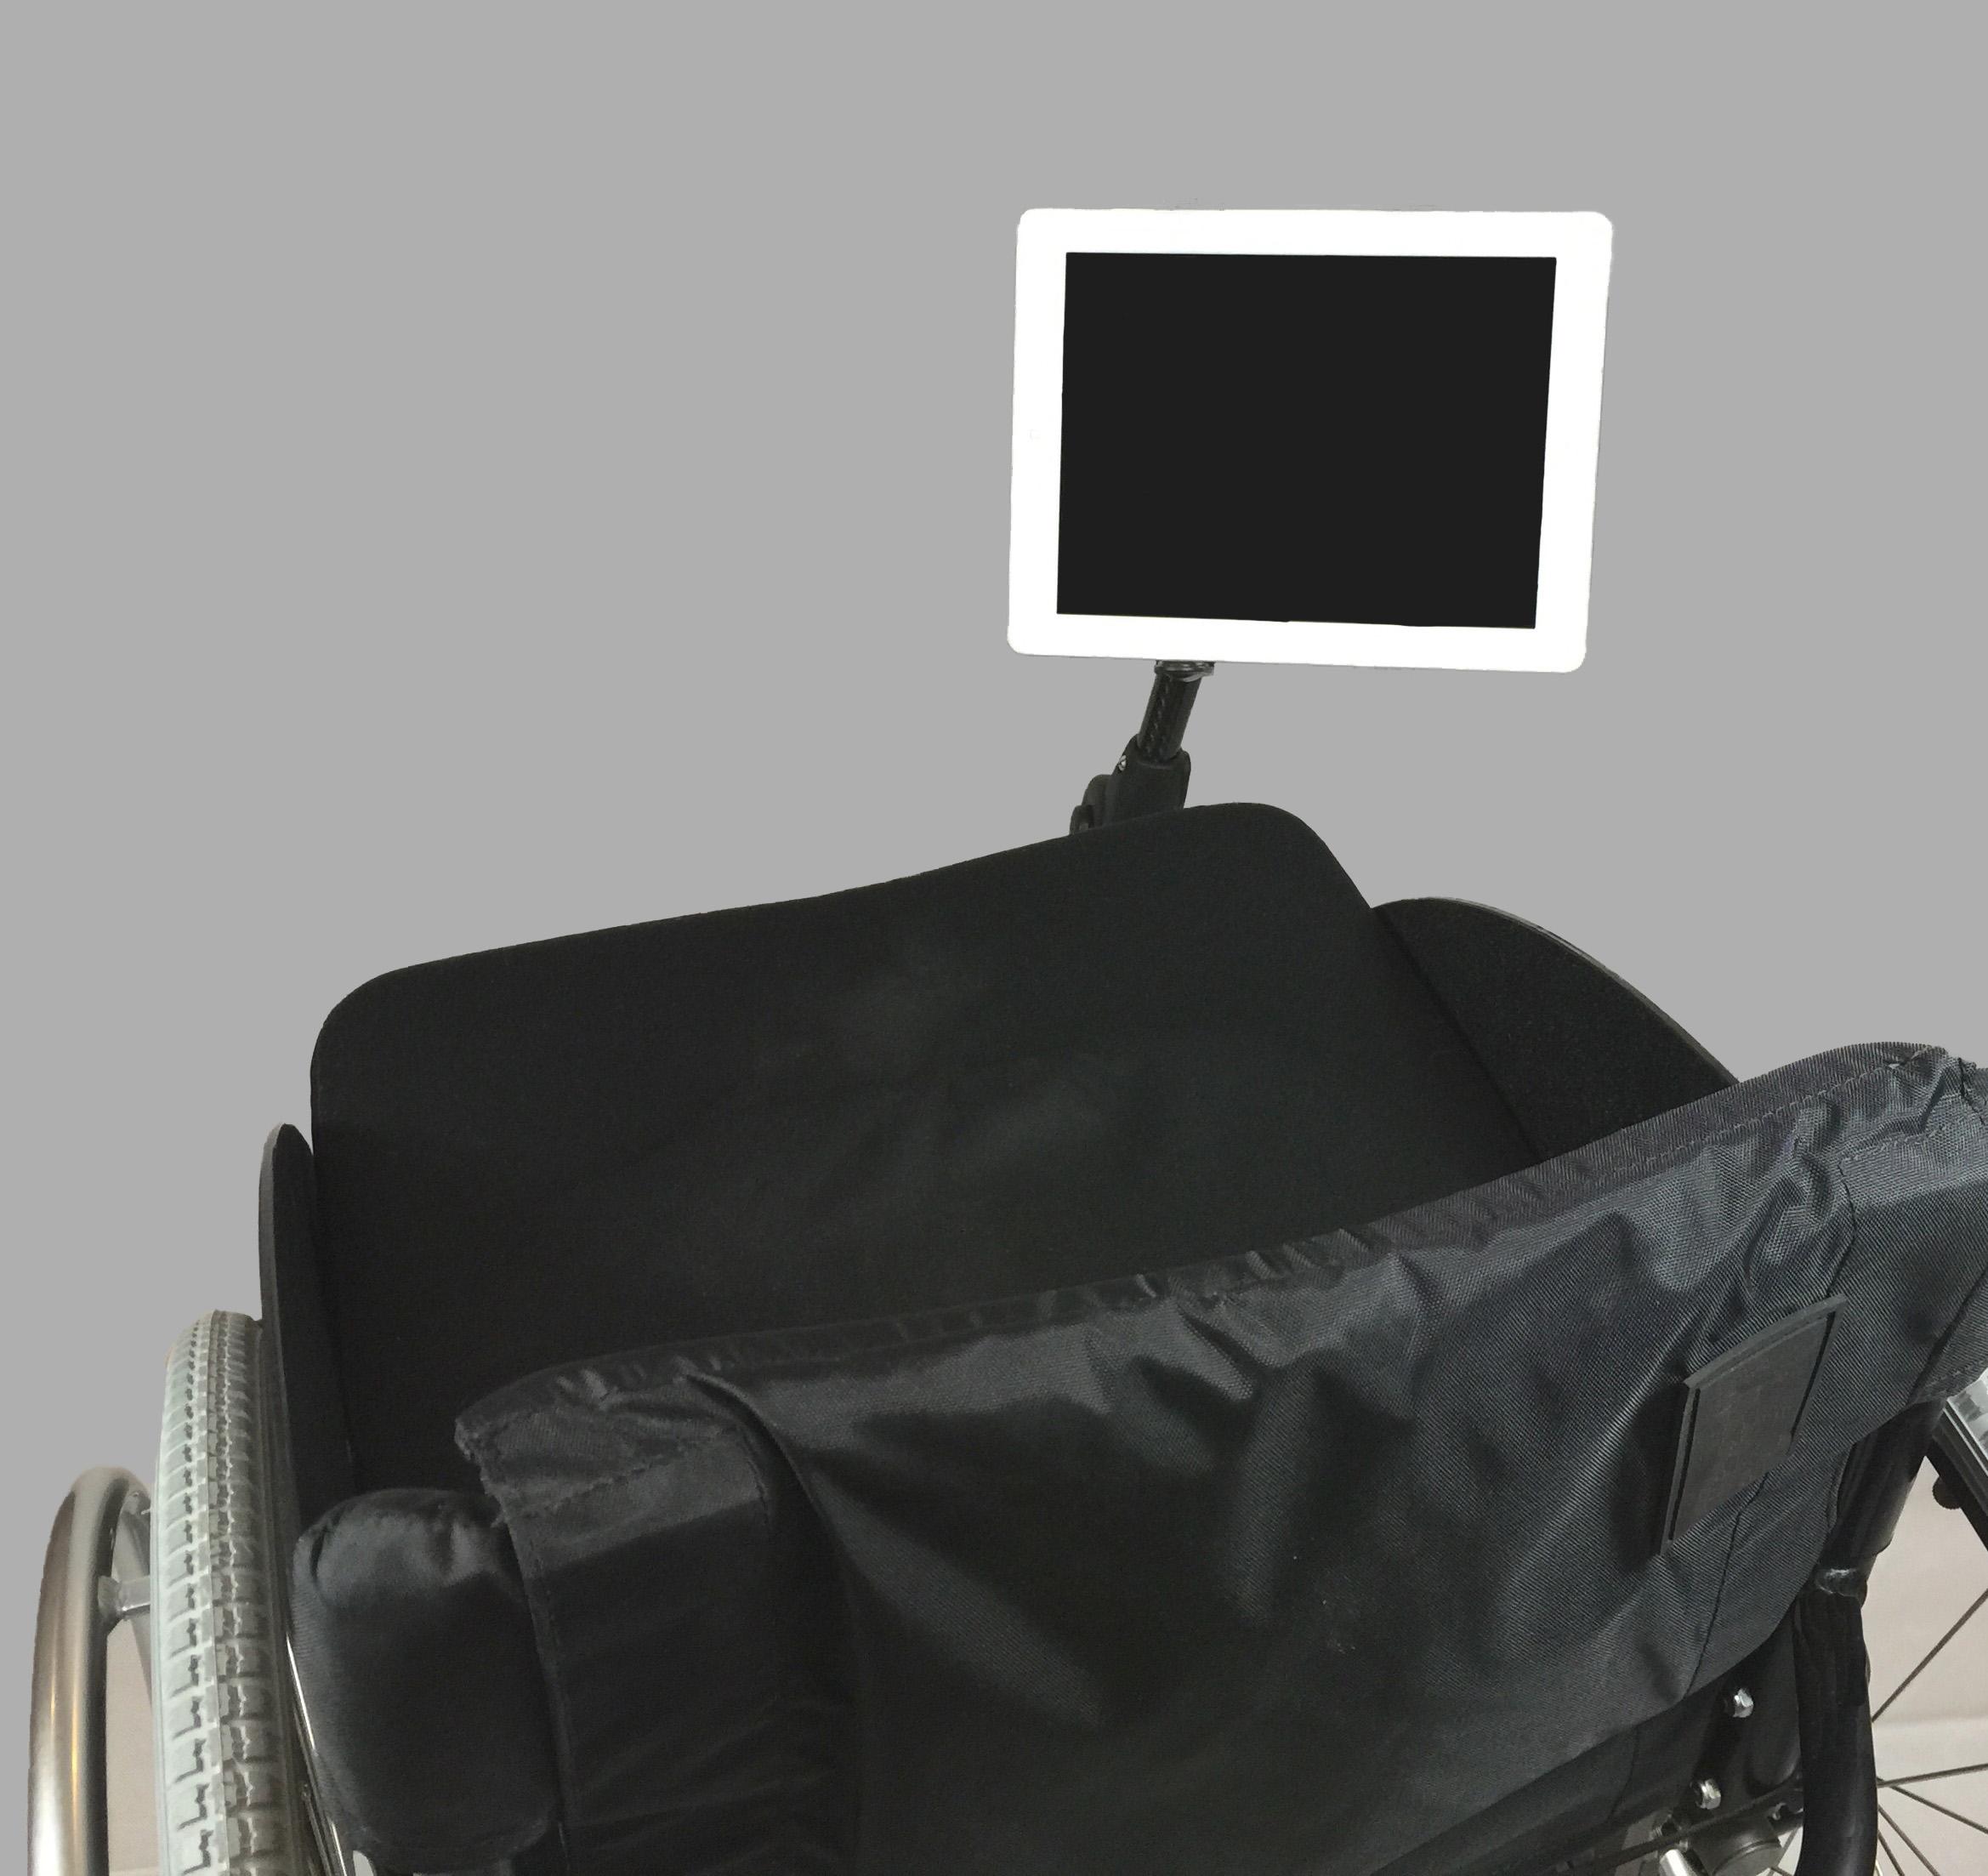 *Orochi Tablet Mount POV Angle.jpg